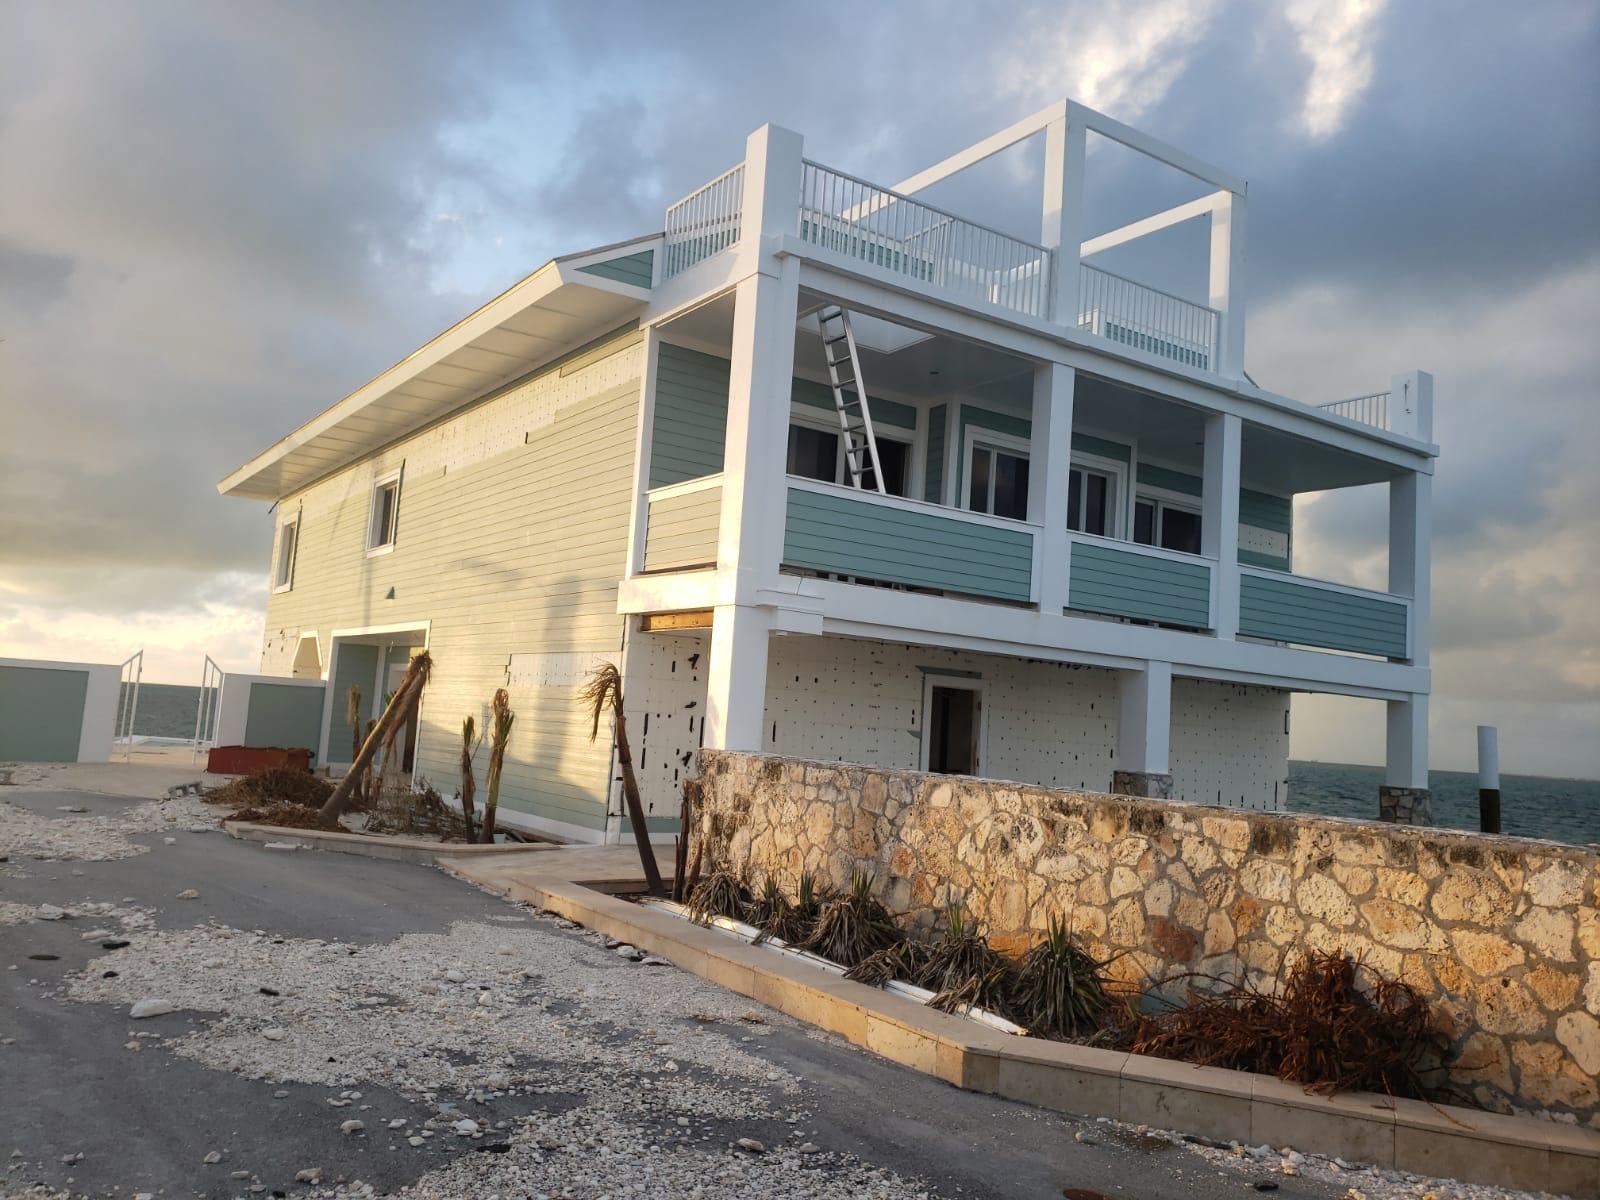 Amvic Icf Home Survives Hurricane Dorian As Surroundings